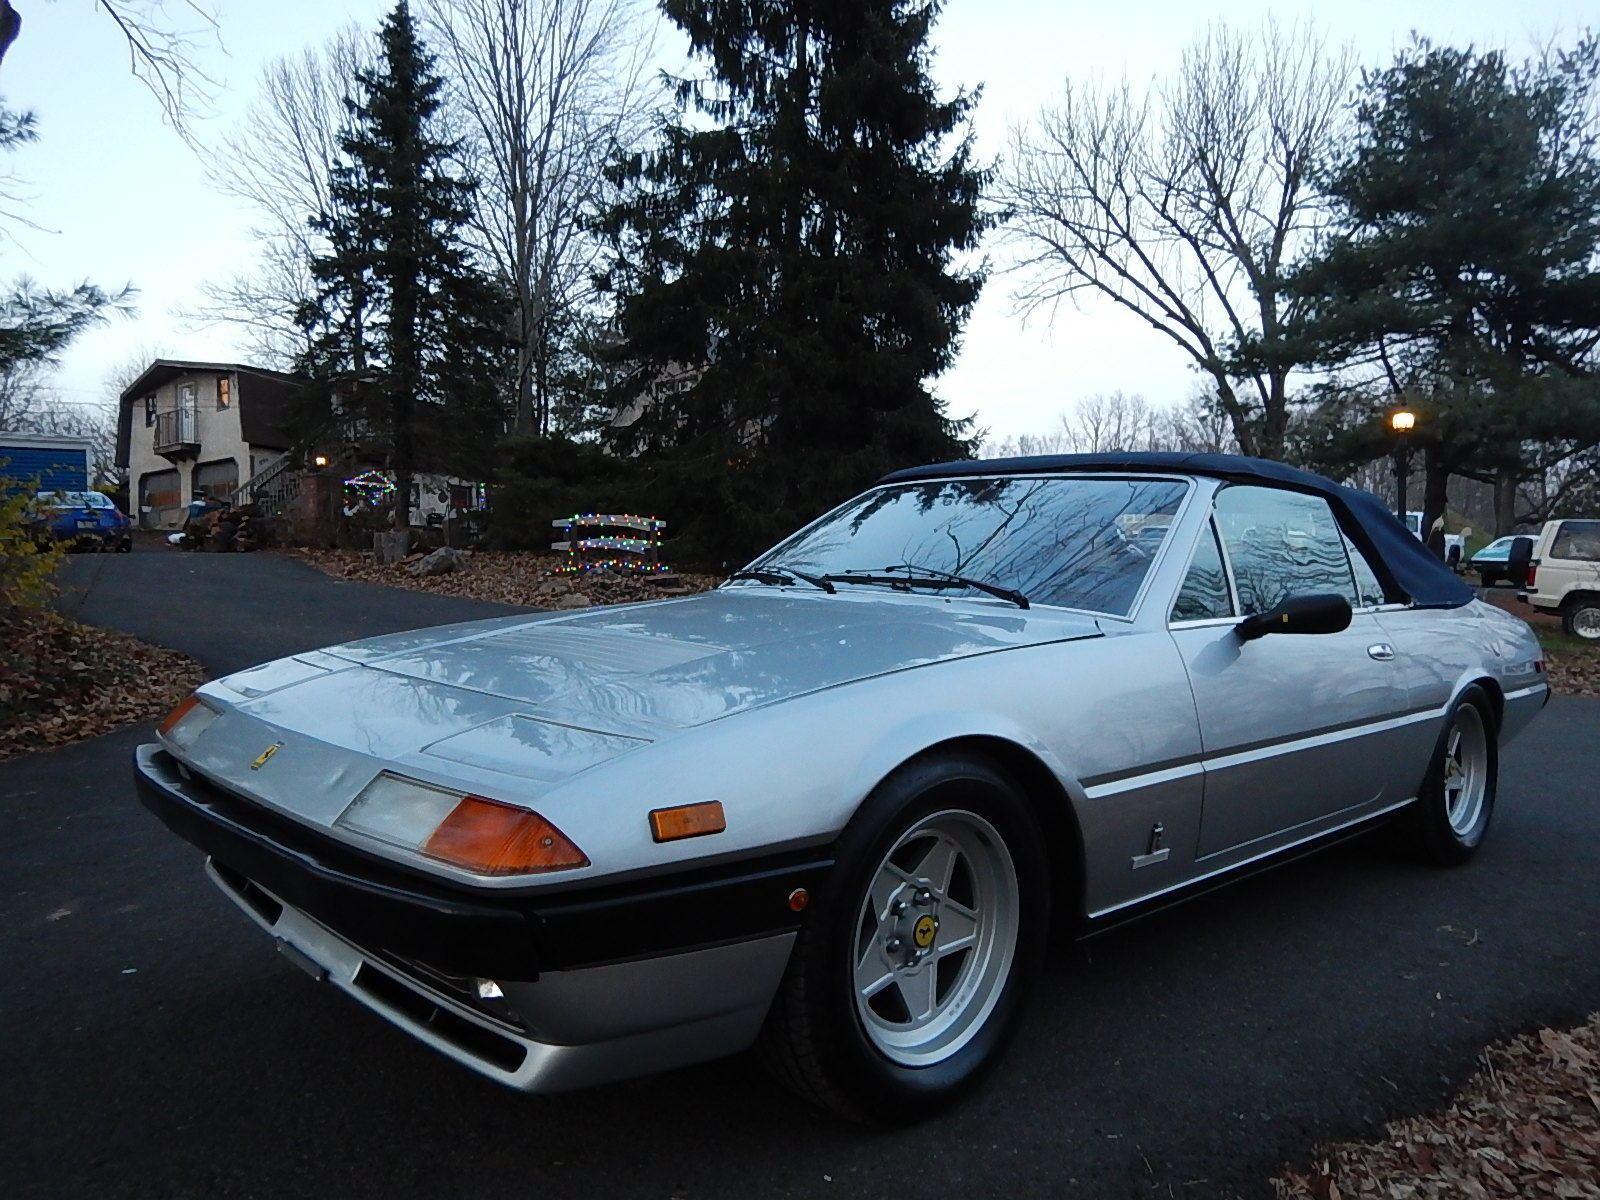 1983 Ferrari 400i Straman Conversion Convertible For Sale